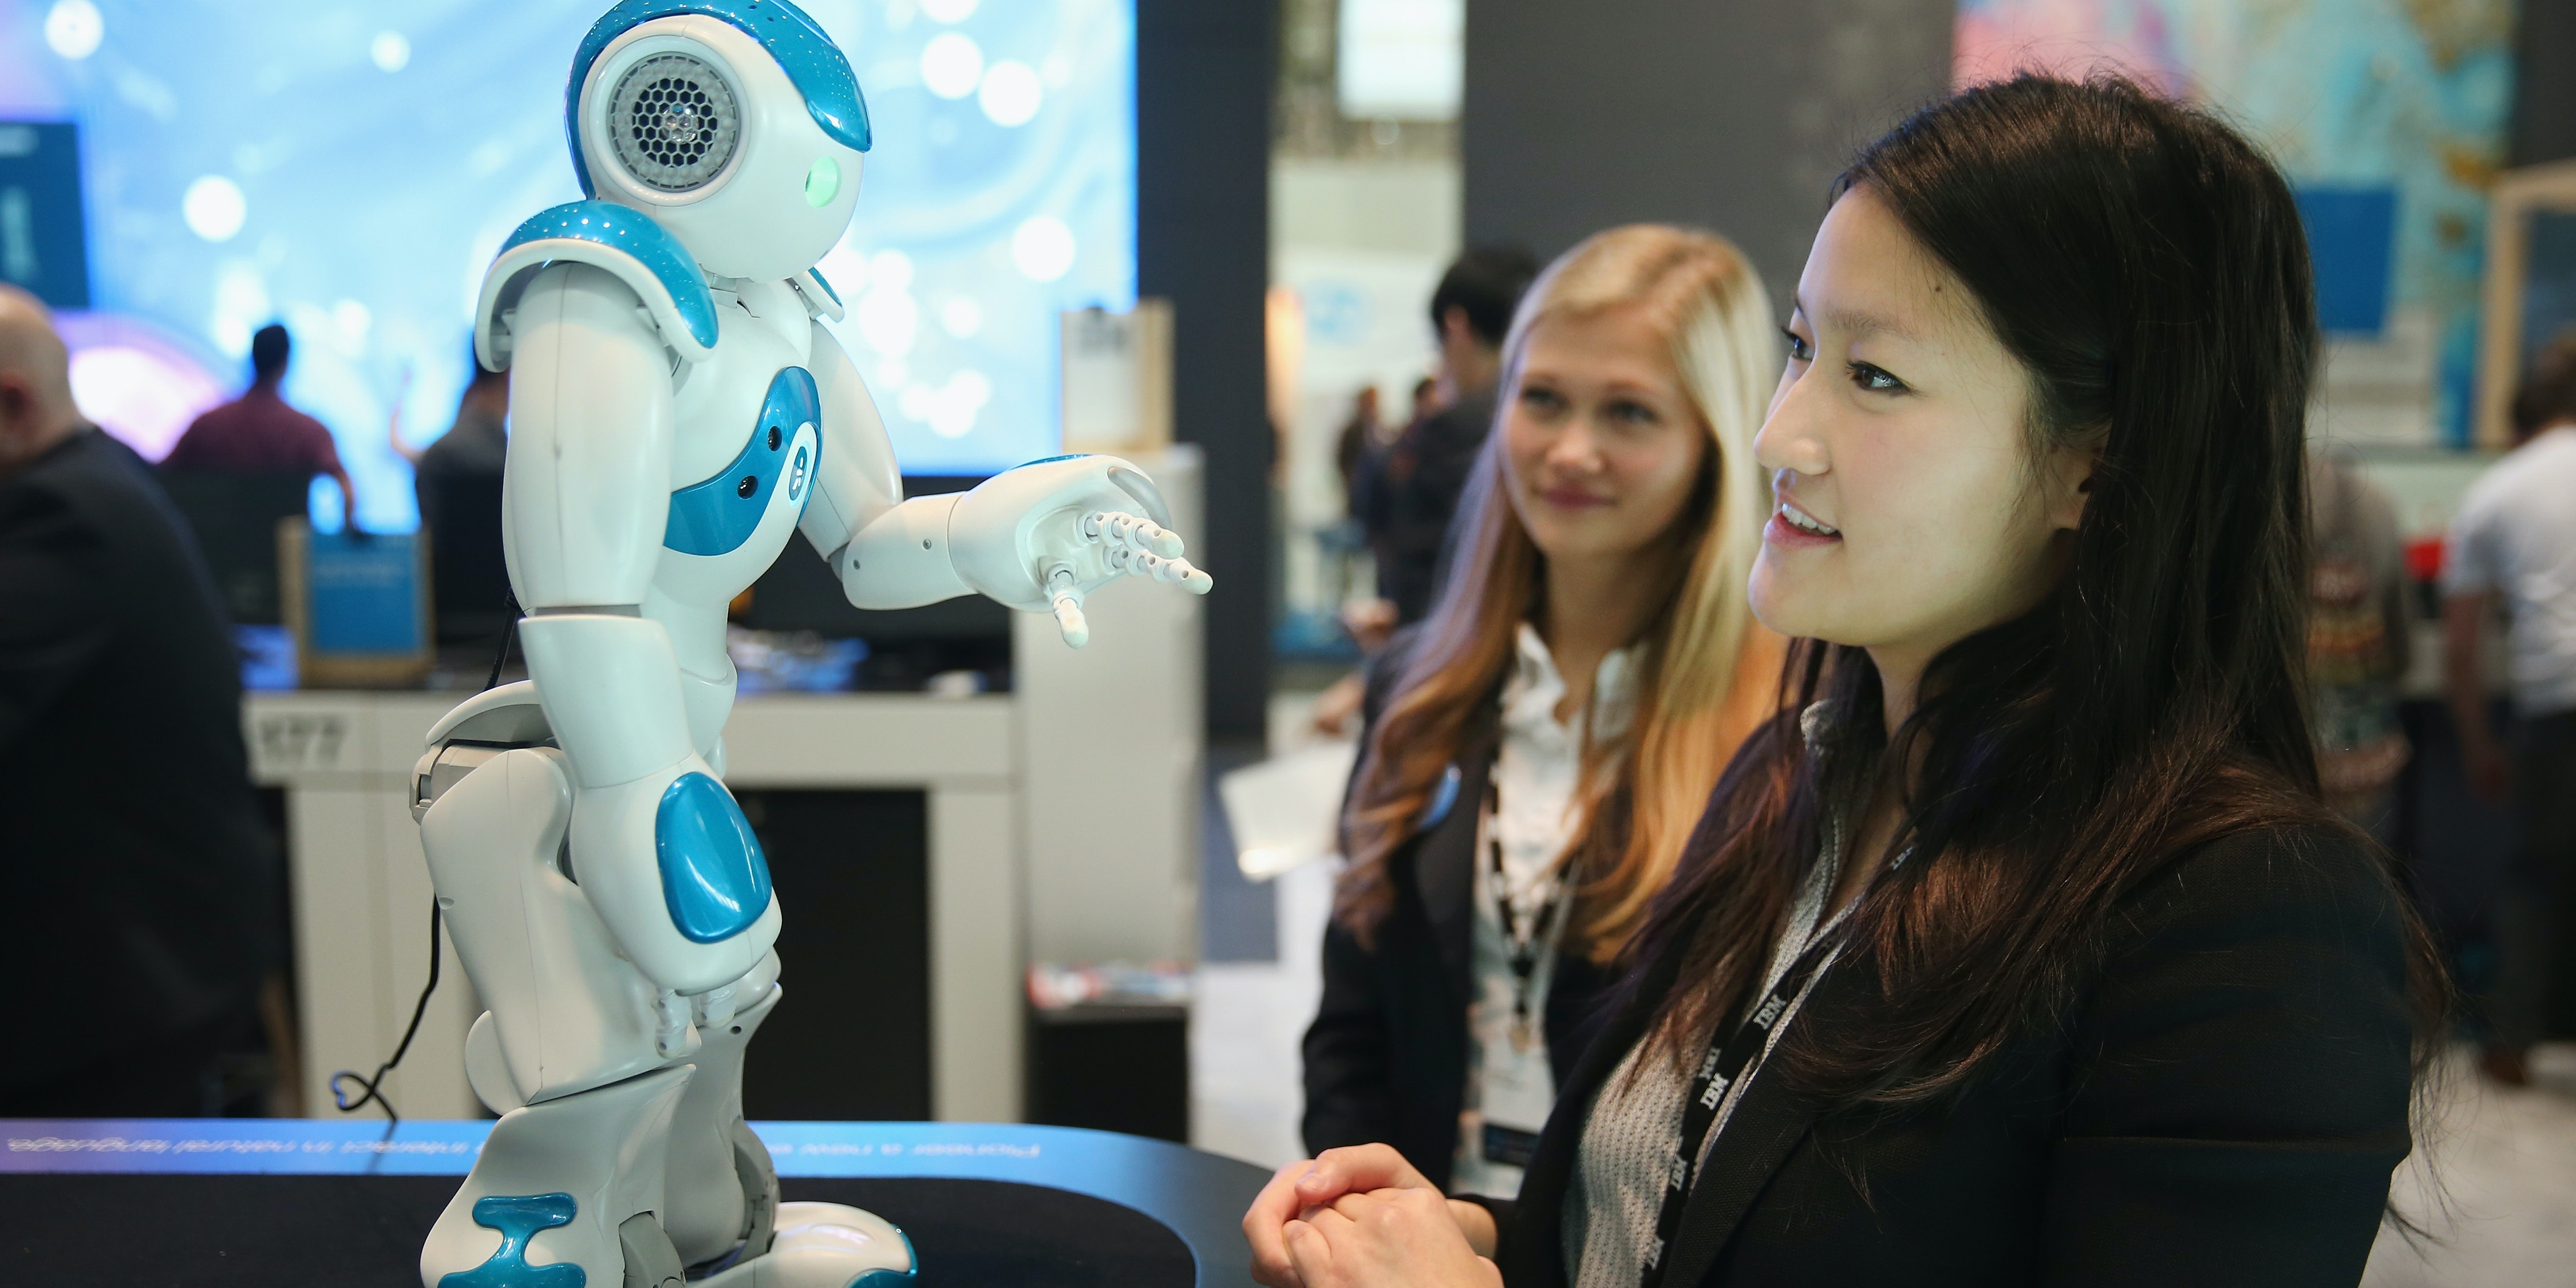 DeepMind A.I. Bridges the Gap Between Robot and Human Voices